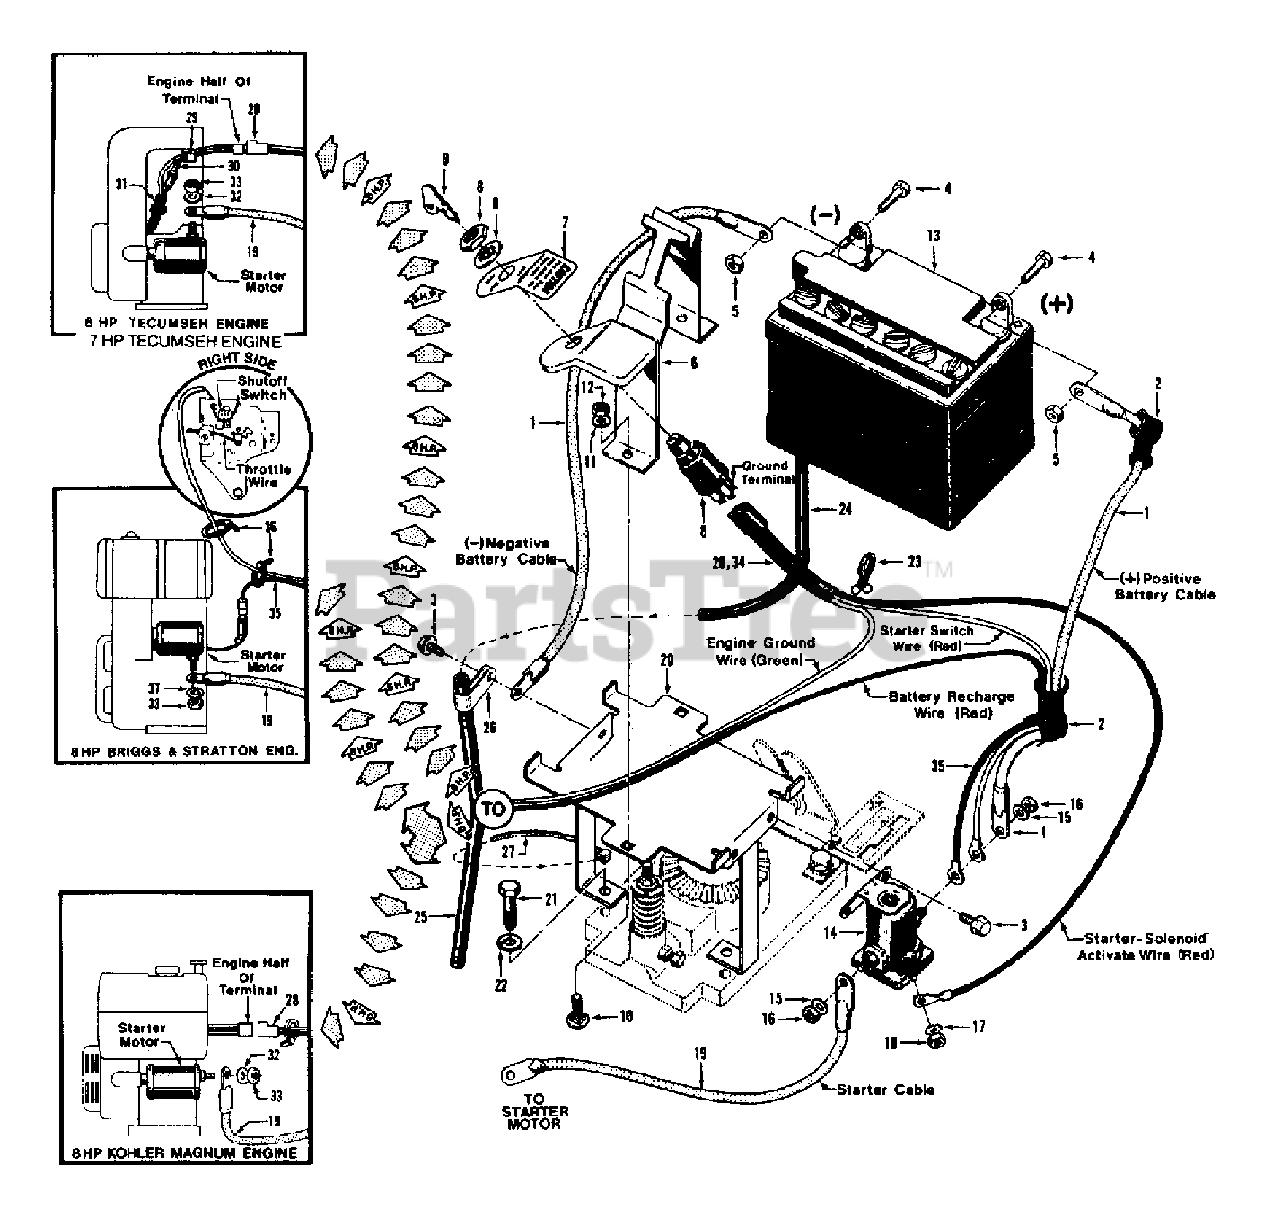 [CSDW_4250]   Troy-Bilt 6000-8811 - Troy-Bilt Horse III Rear-Tine Tiller Electric Start  System - 6HP, 7HP, & 8HP Tillers Parts Lookup with Diagrams   PartsTree   Troy Bilt Solenoid Wiring Diagram      PartsTree